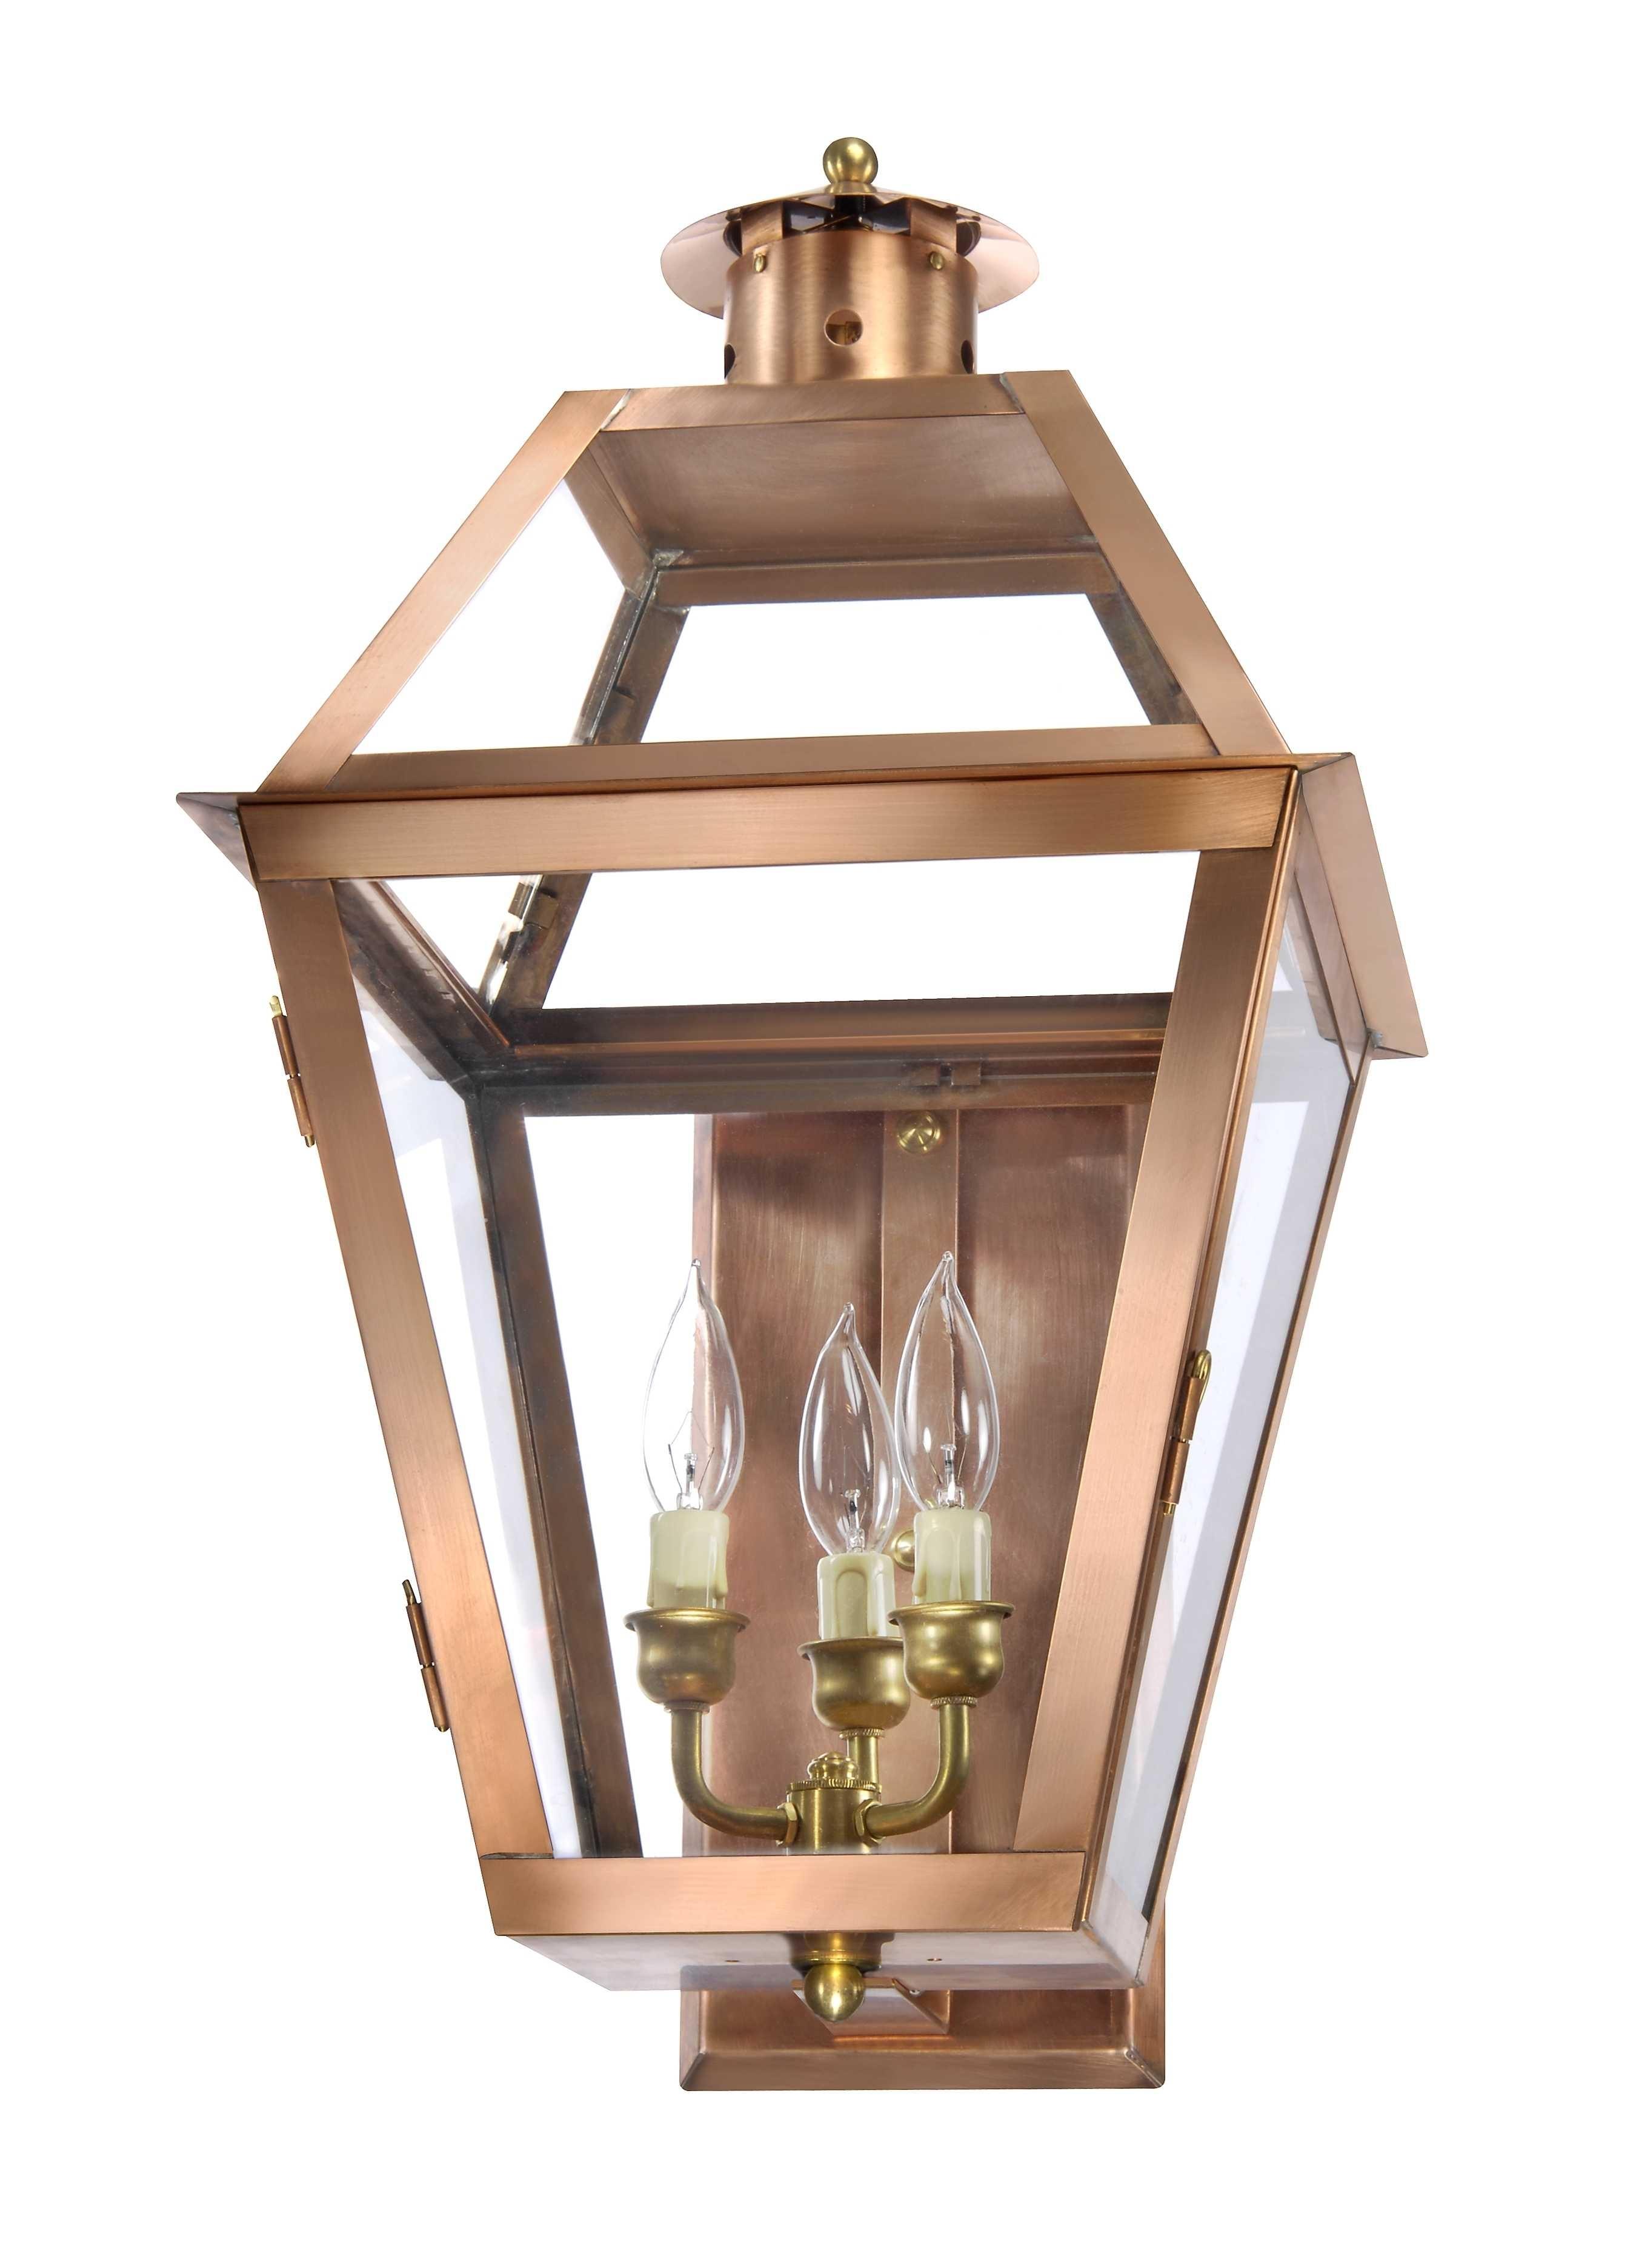 Outdoor Lanterns | Copper Exterior Lighting – Lantern & Scroll Within Copper Outdoor Lanterns (View 13 of 20)